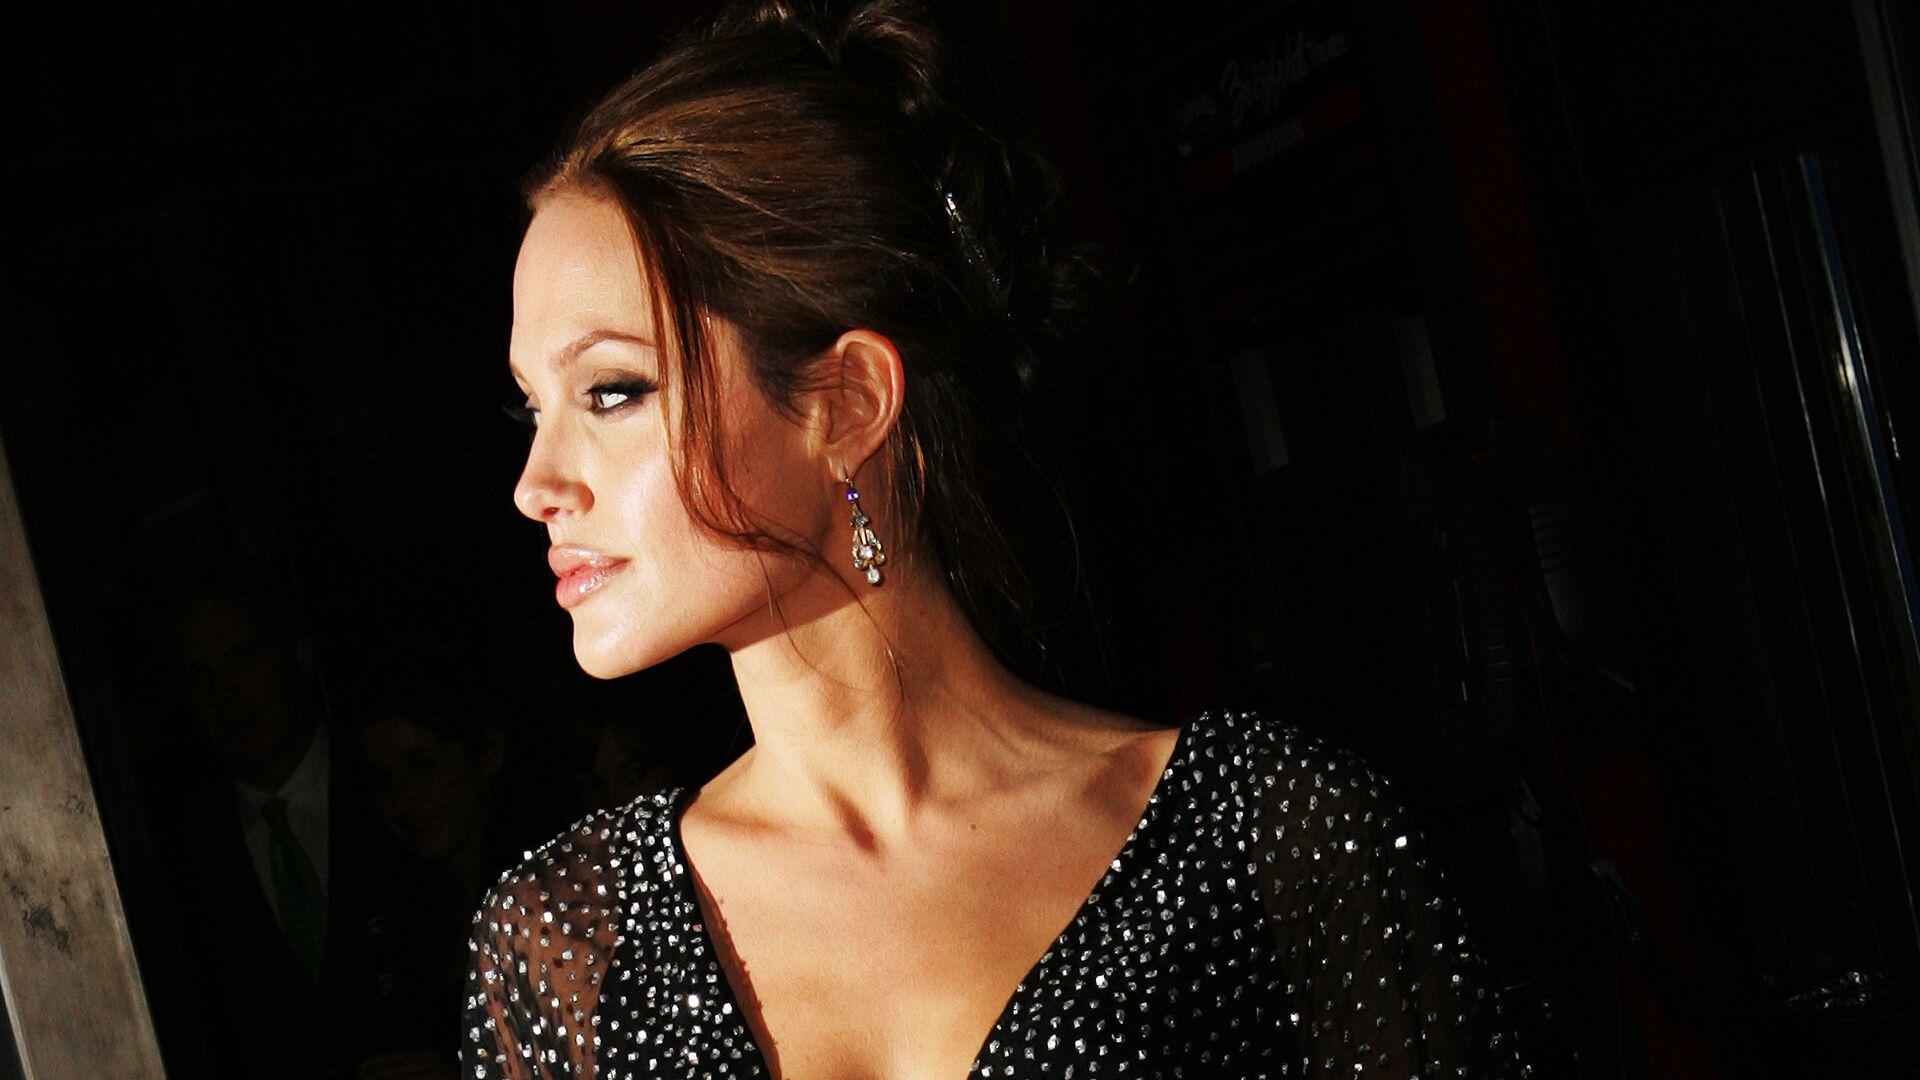 Актриса Анджелина Джоли, 2006 - РИА Новости, 1920, 04.06.2021